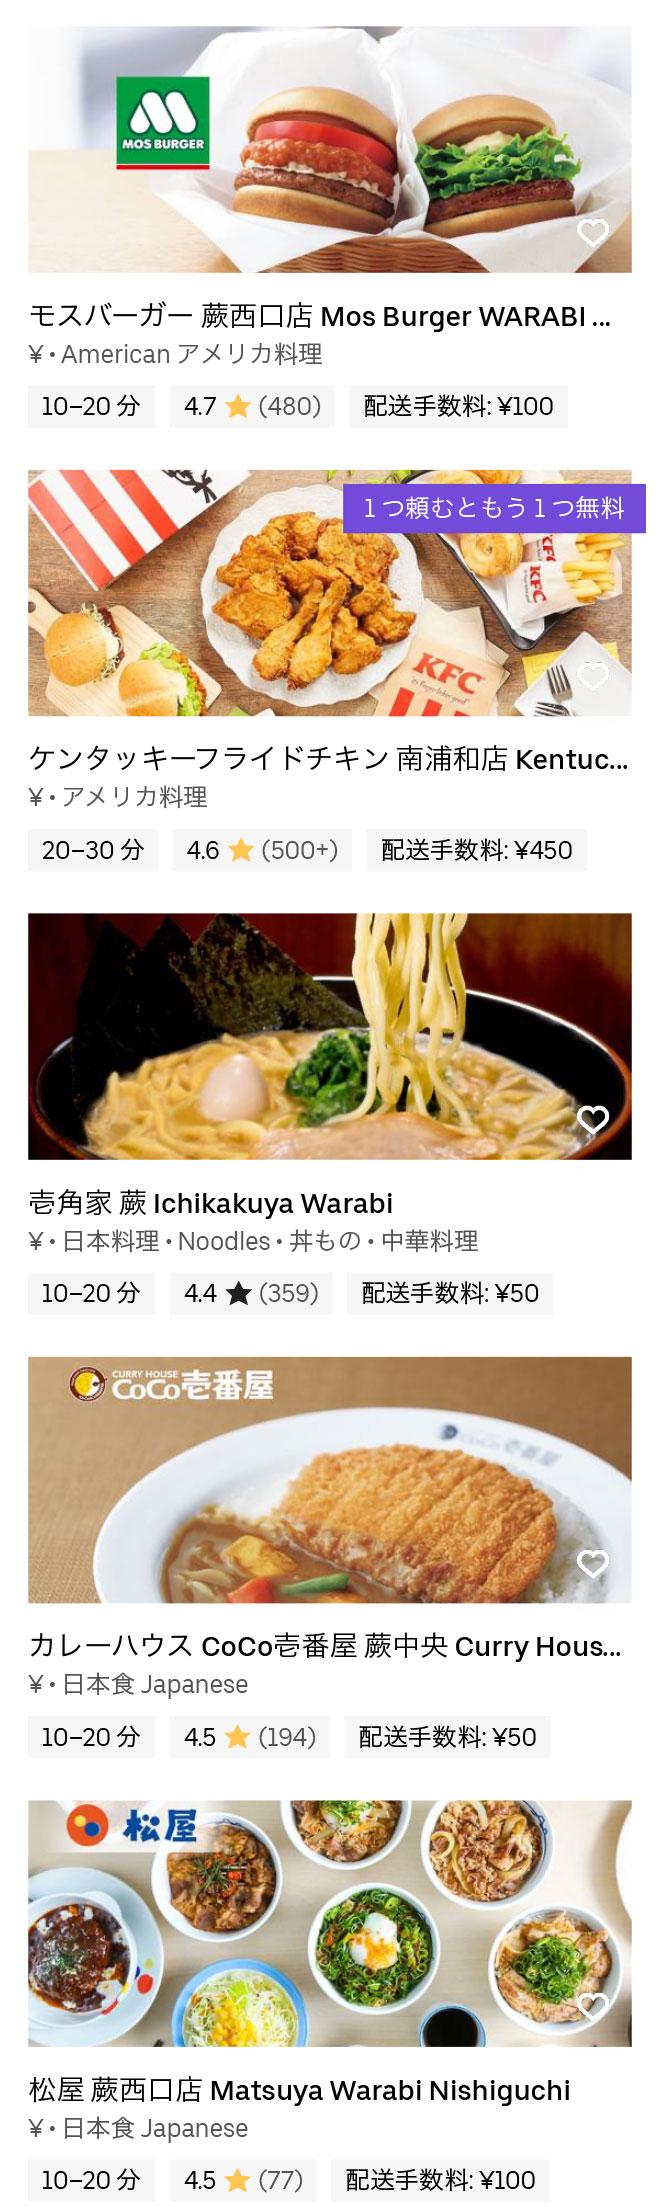 Saitama warabi 200302